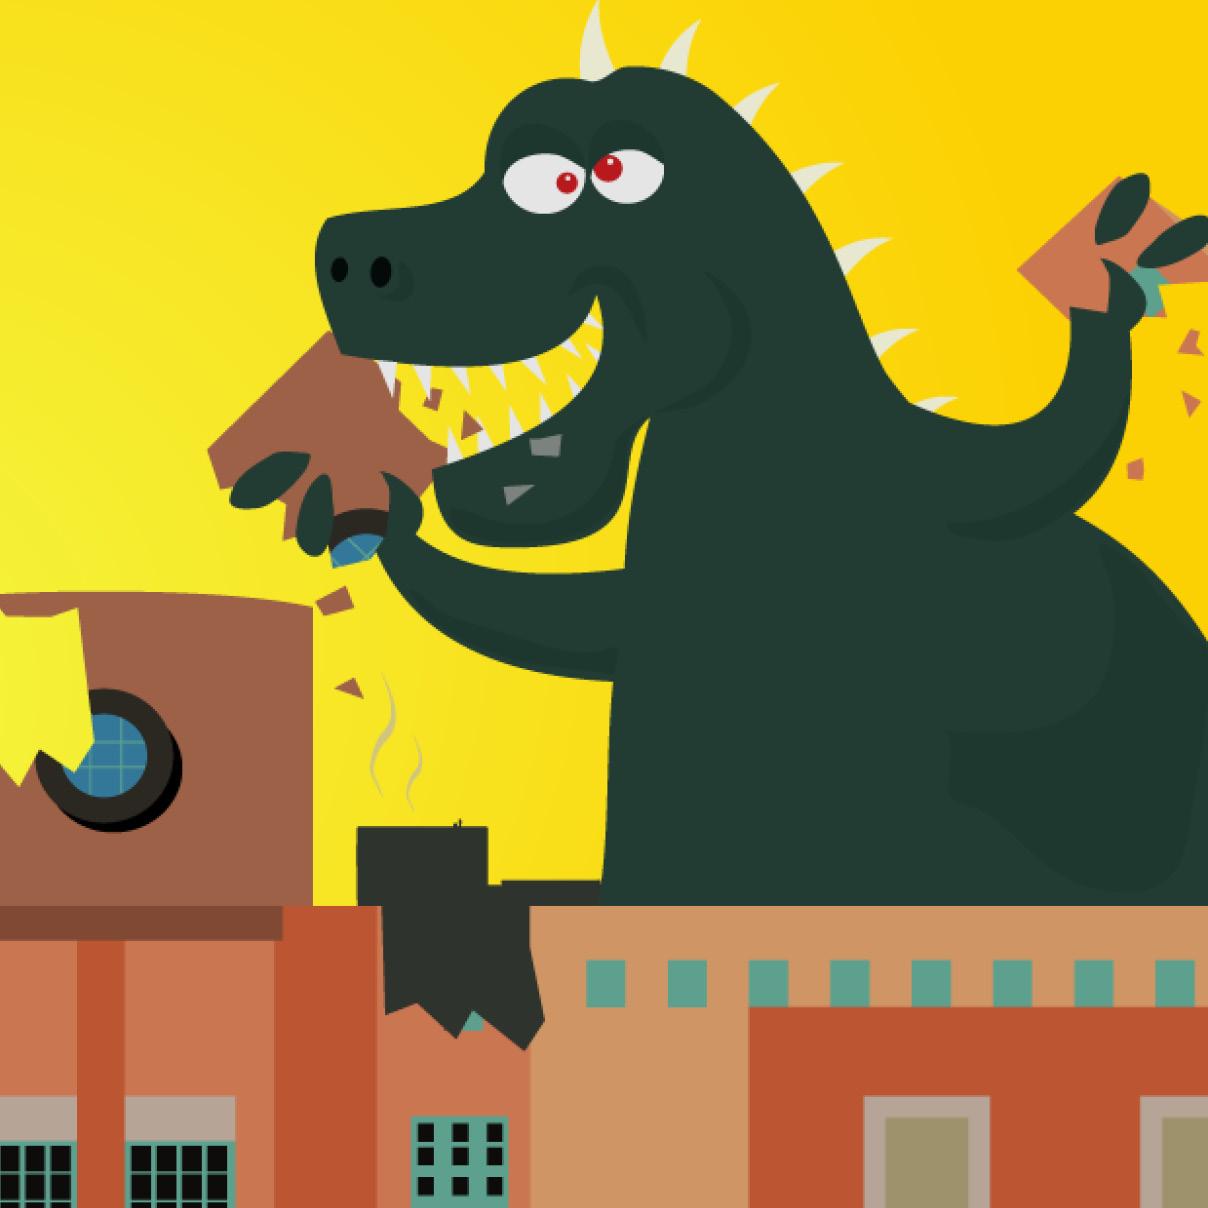 Cartoon of Godzilla type creature eating the library